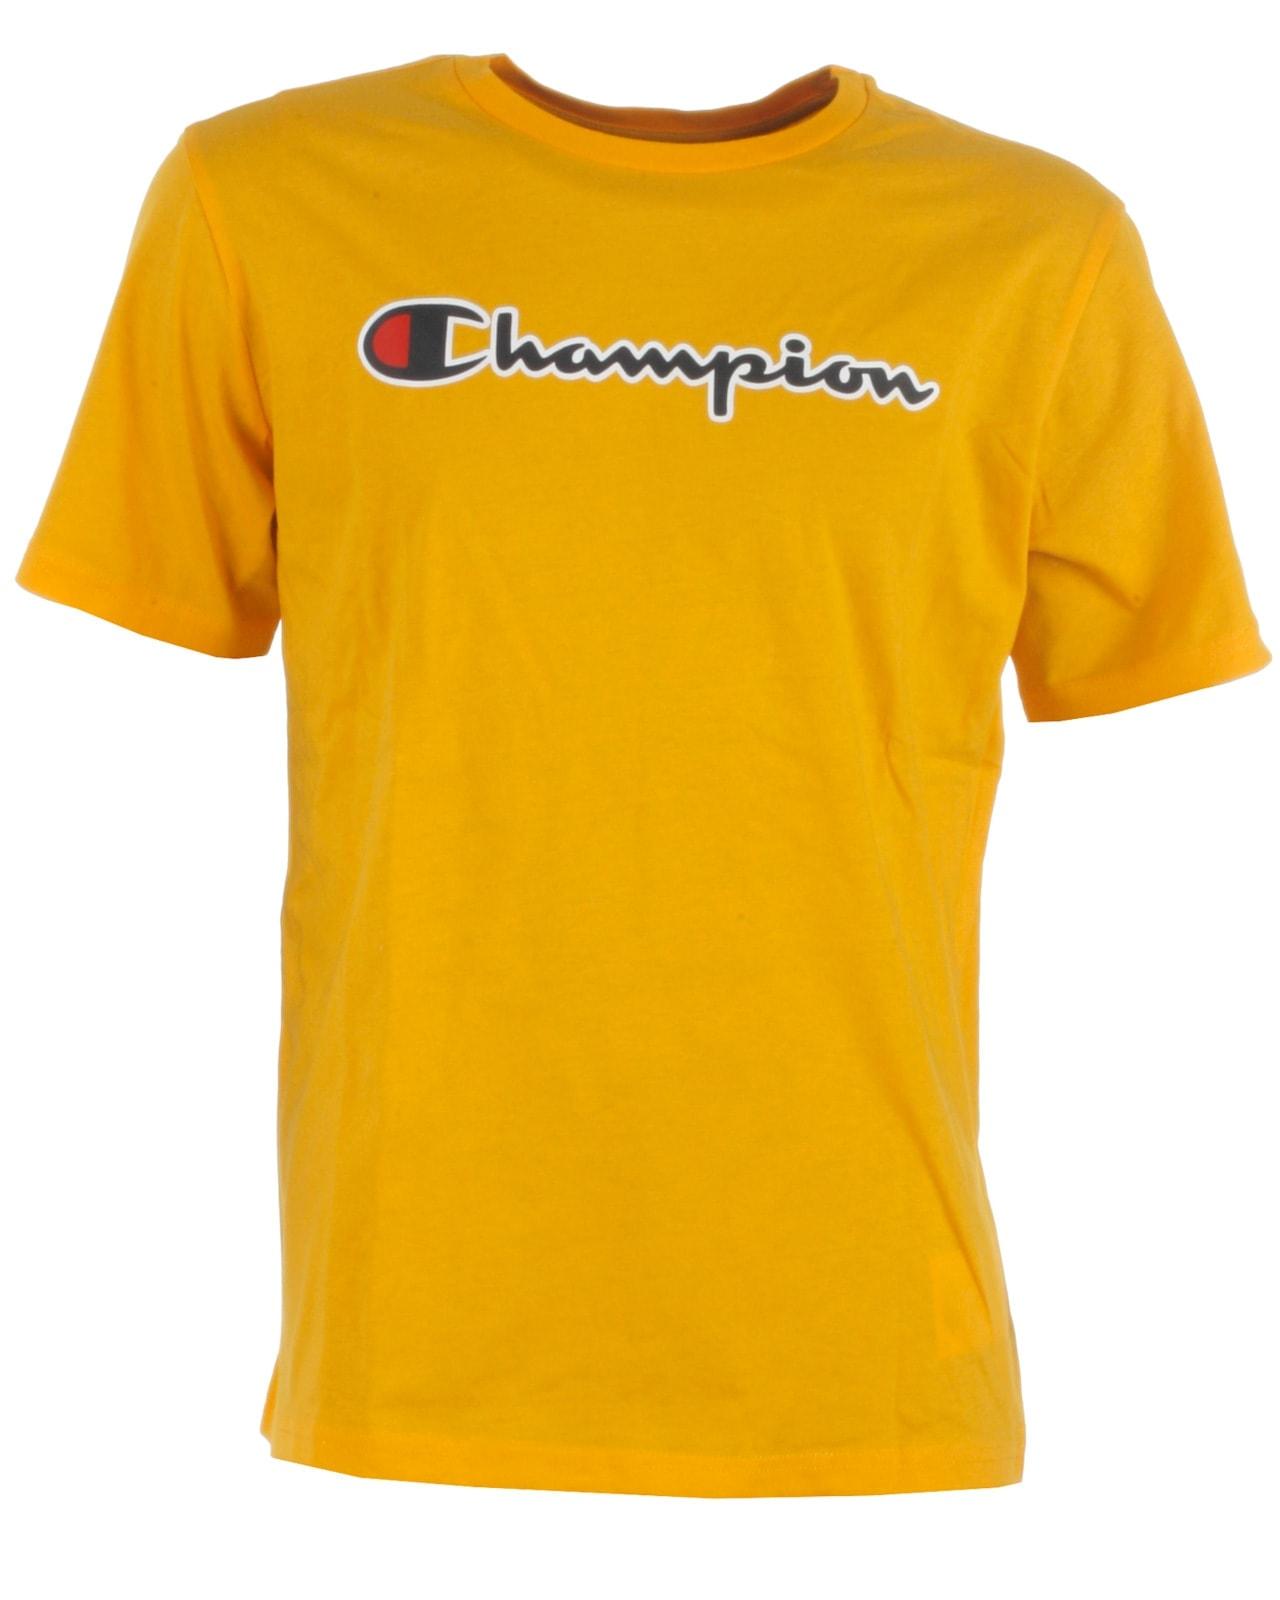 Image of Champion t-shirt s/s, ctr